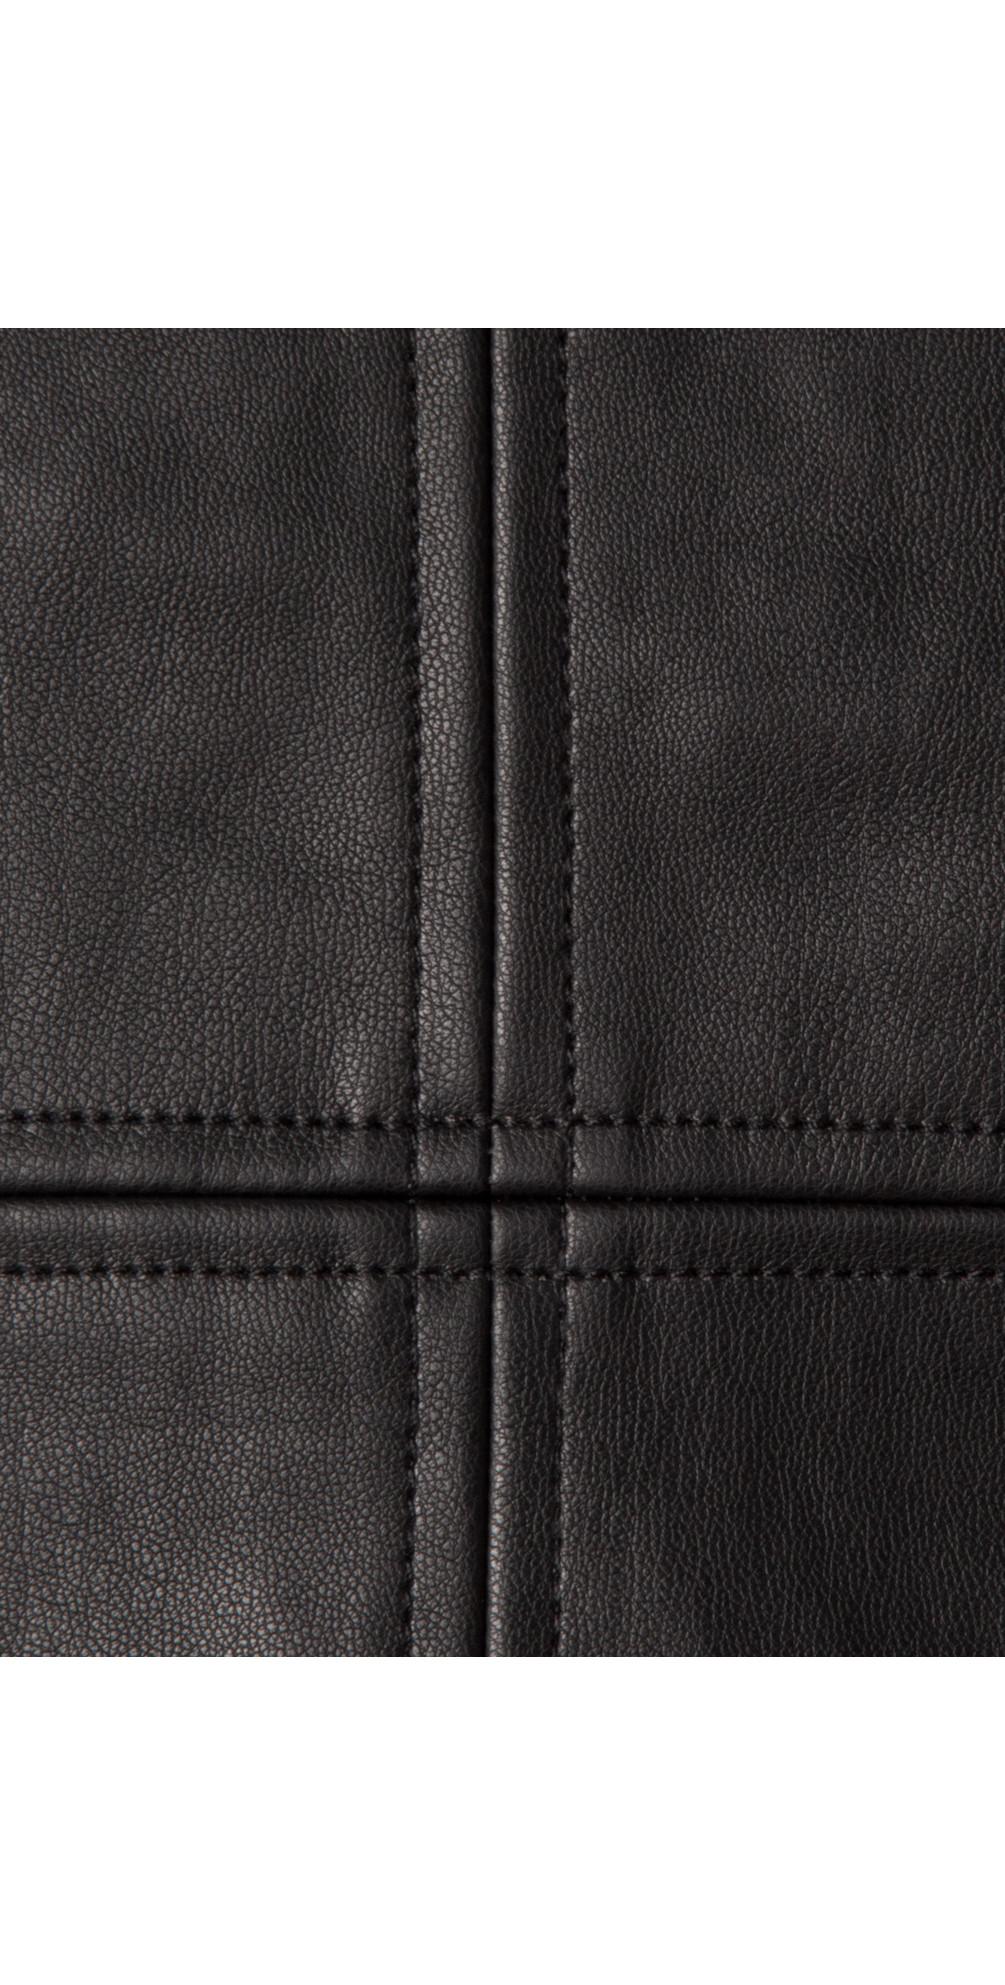 Rapture Seam Detail Skirt main image